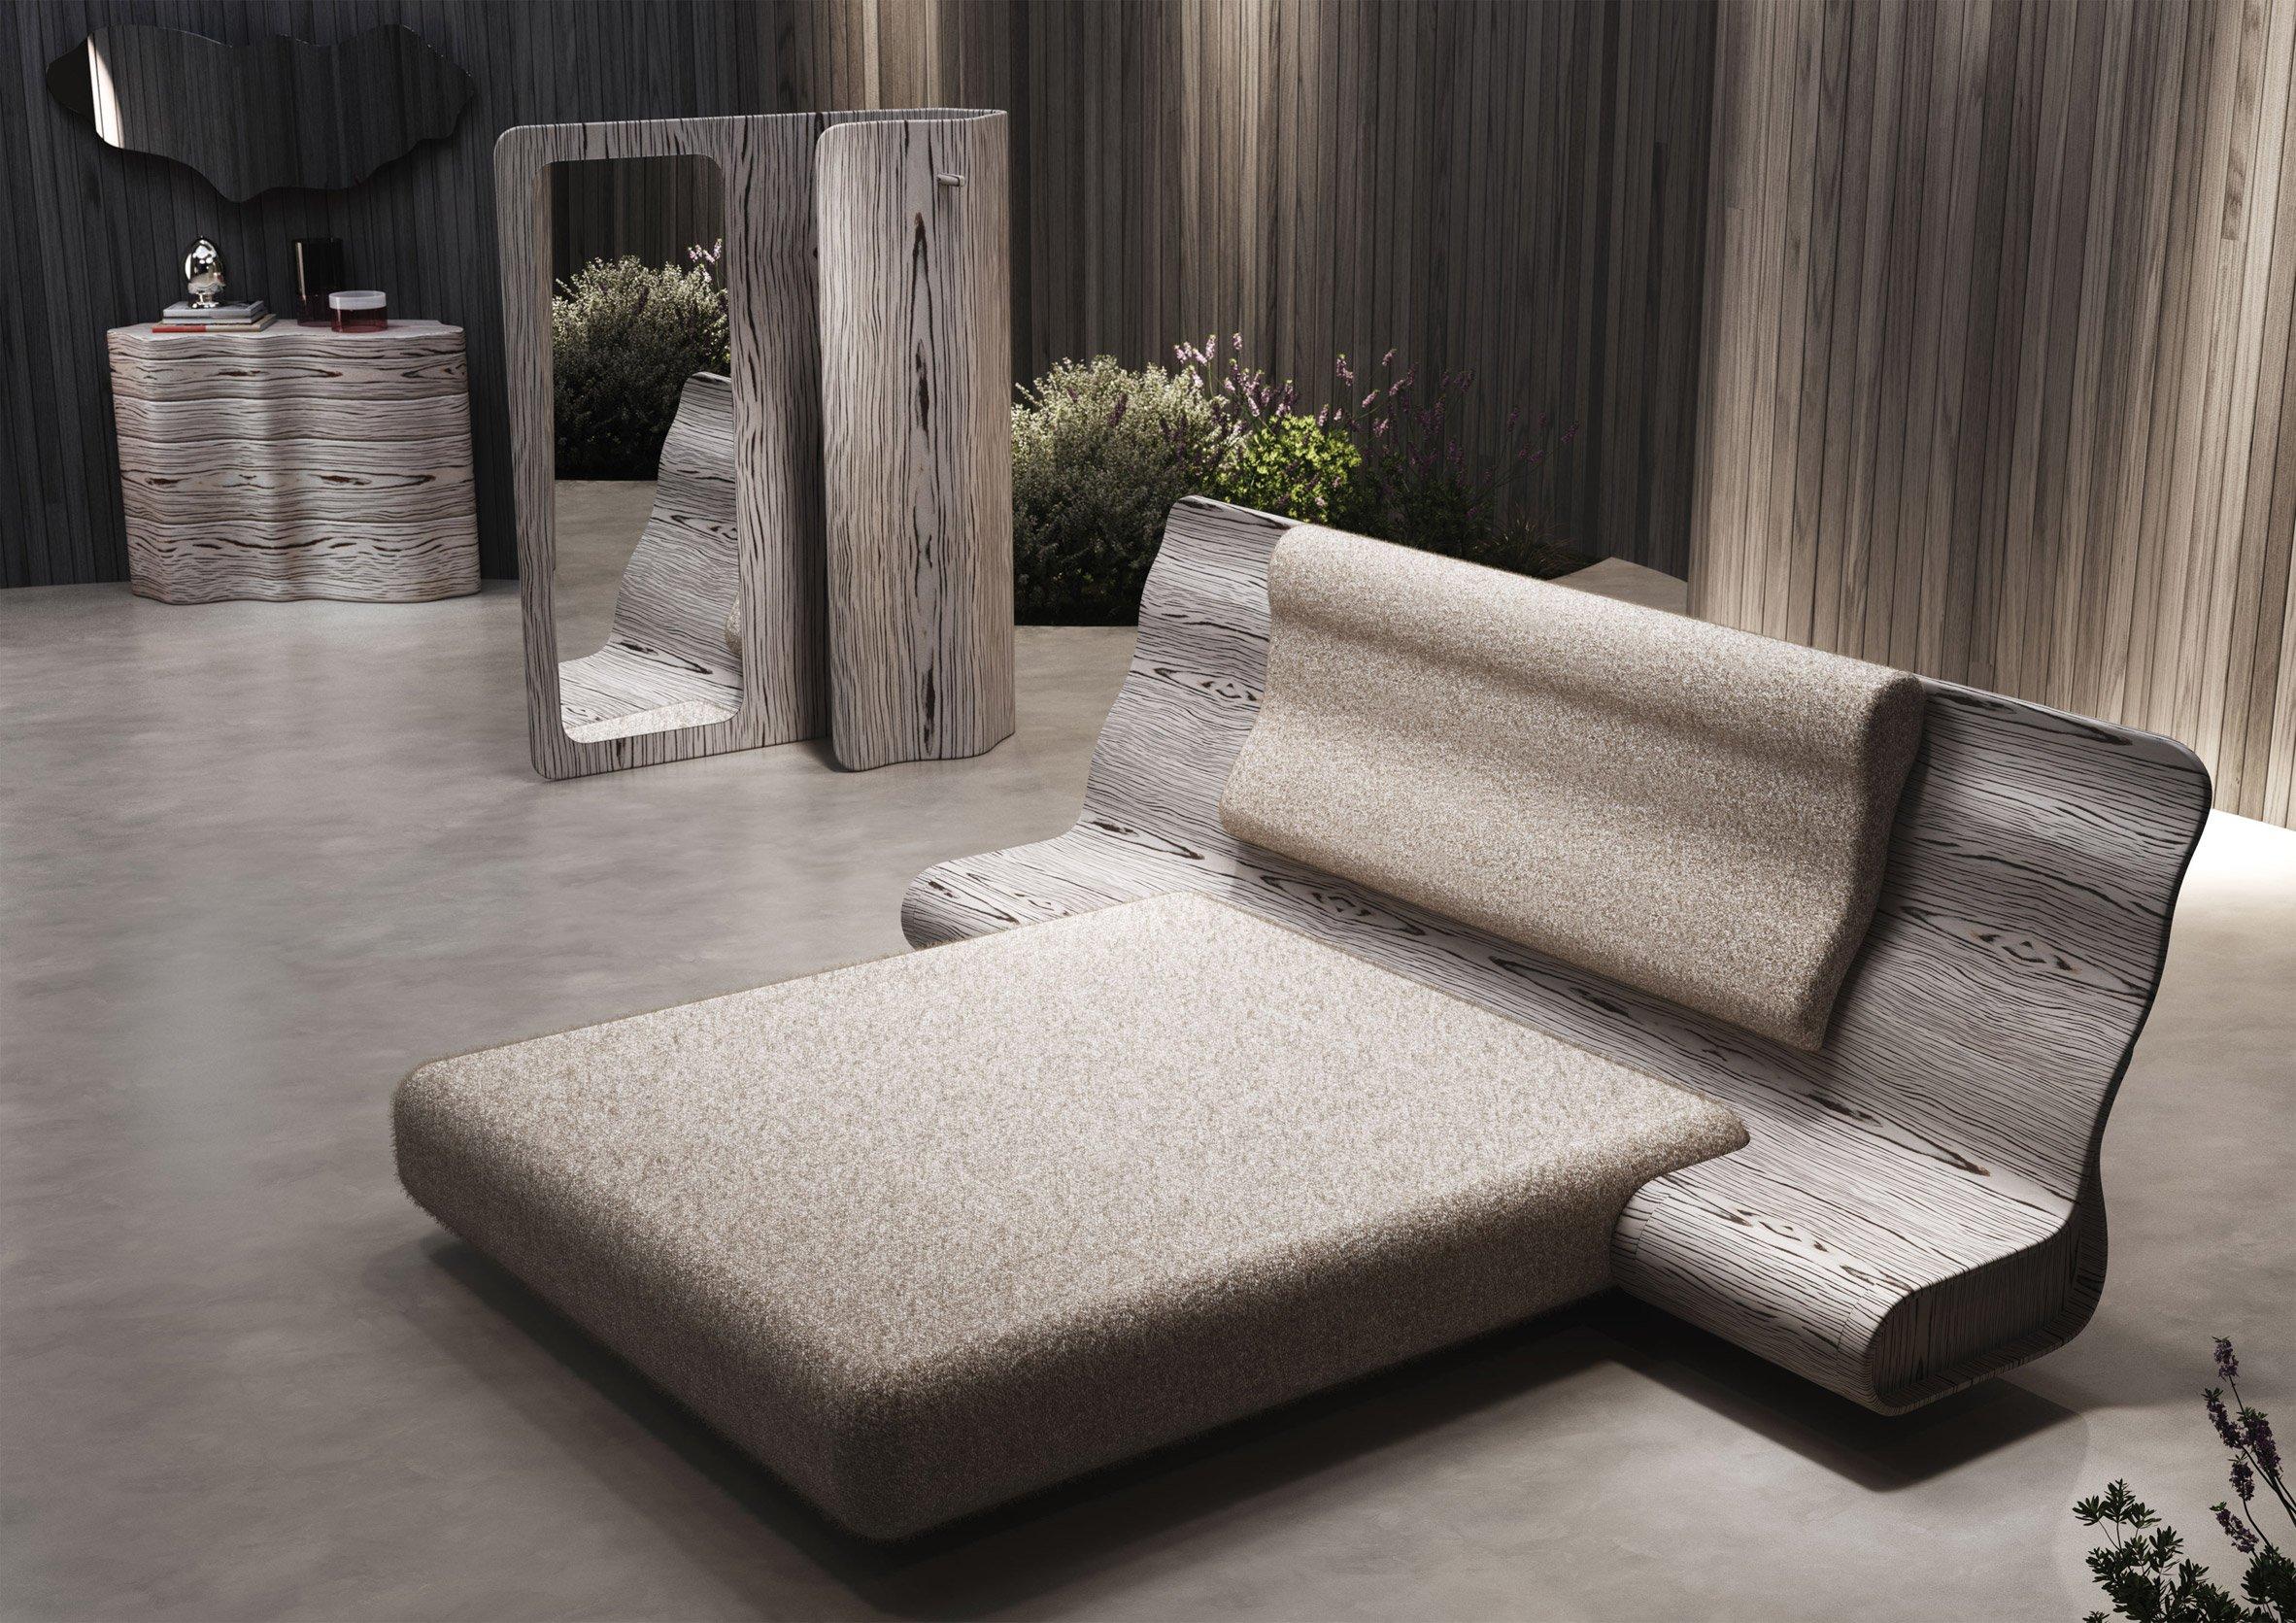 ross-lovegrove-for-eco-friendly-design-03